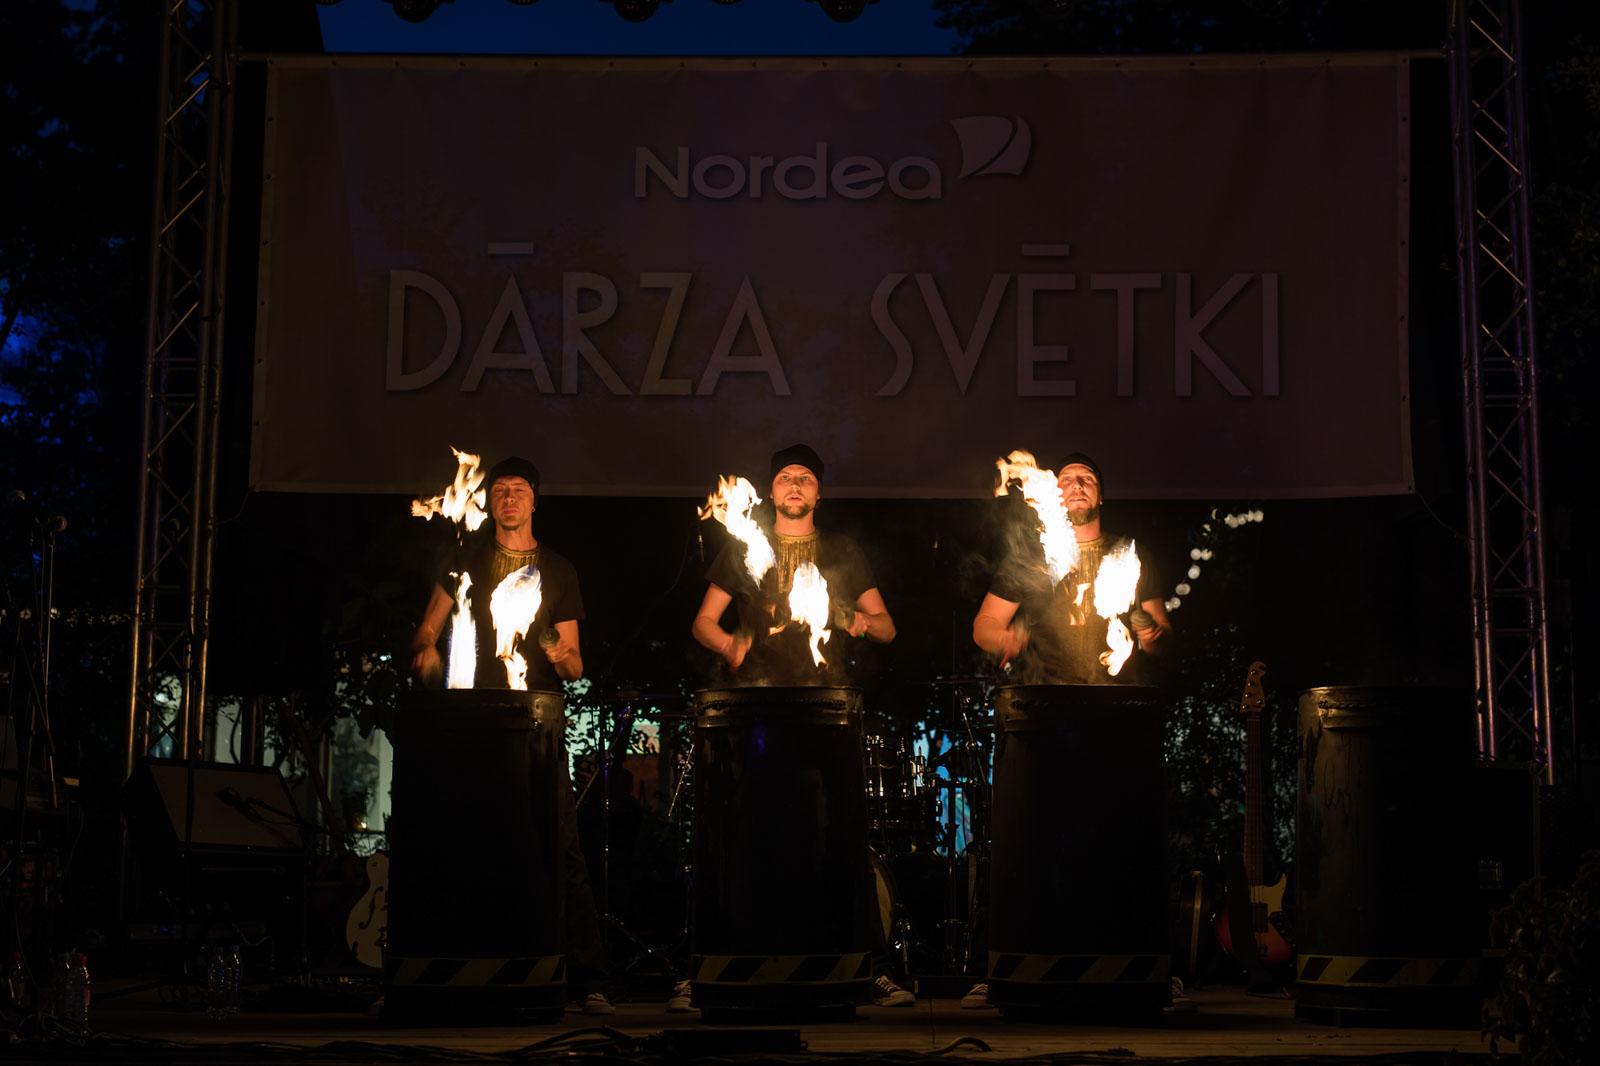 Nordea_DarzaSvetki_s-477